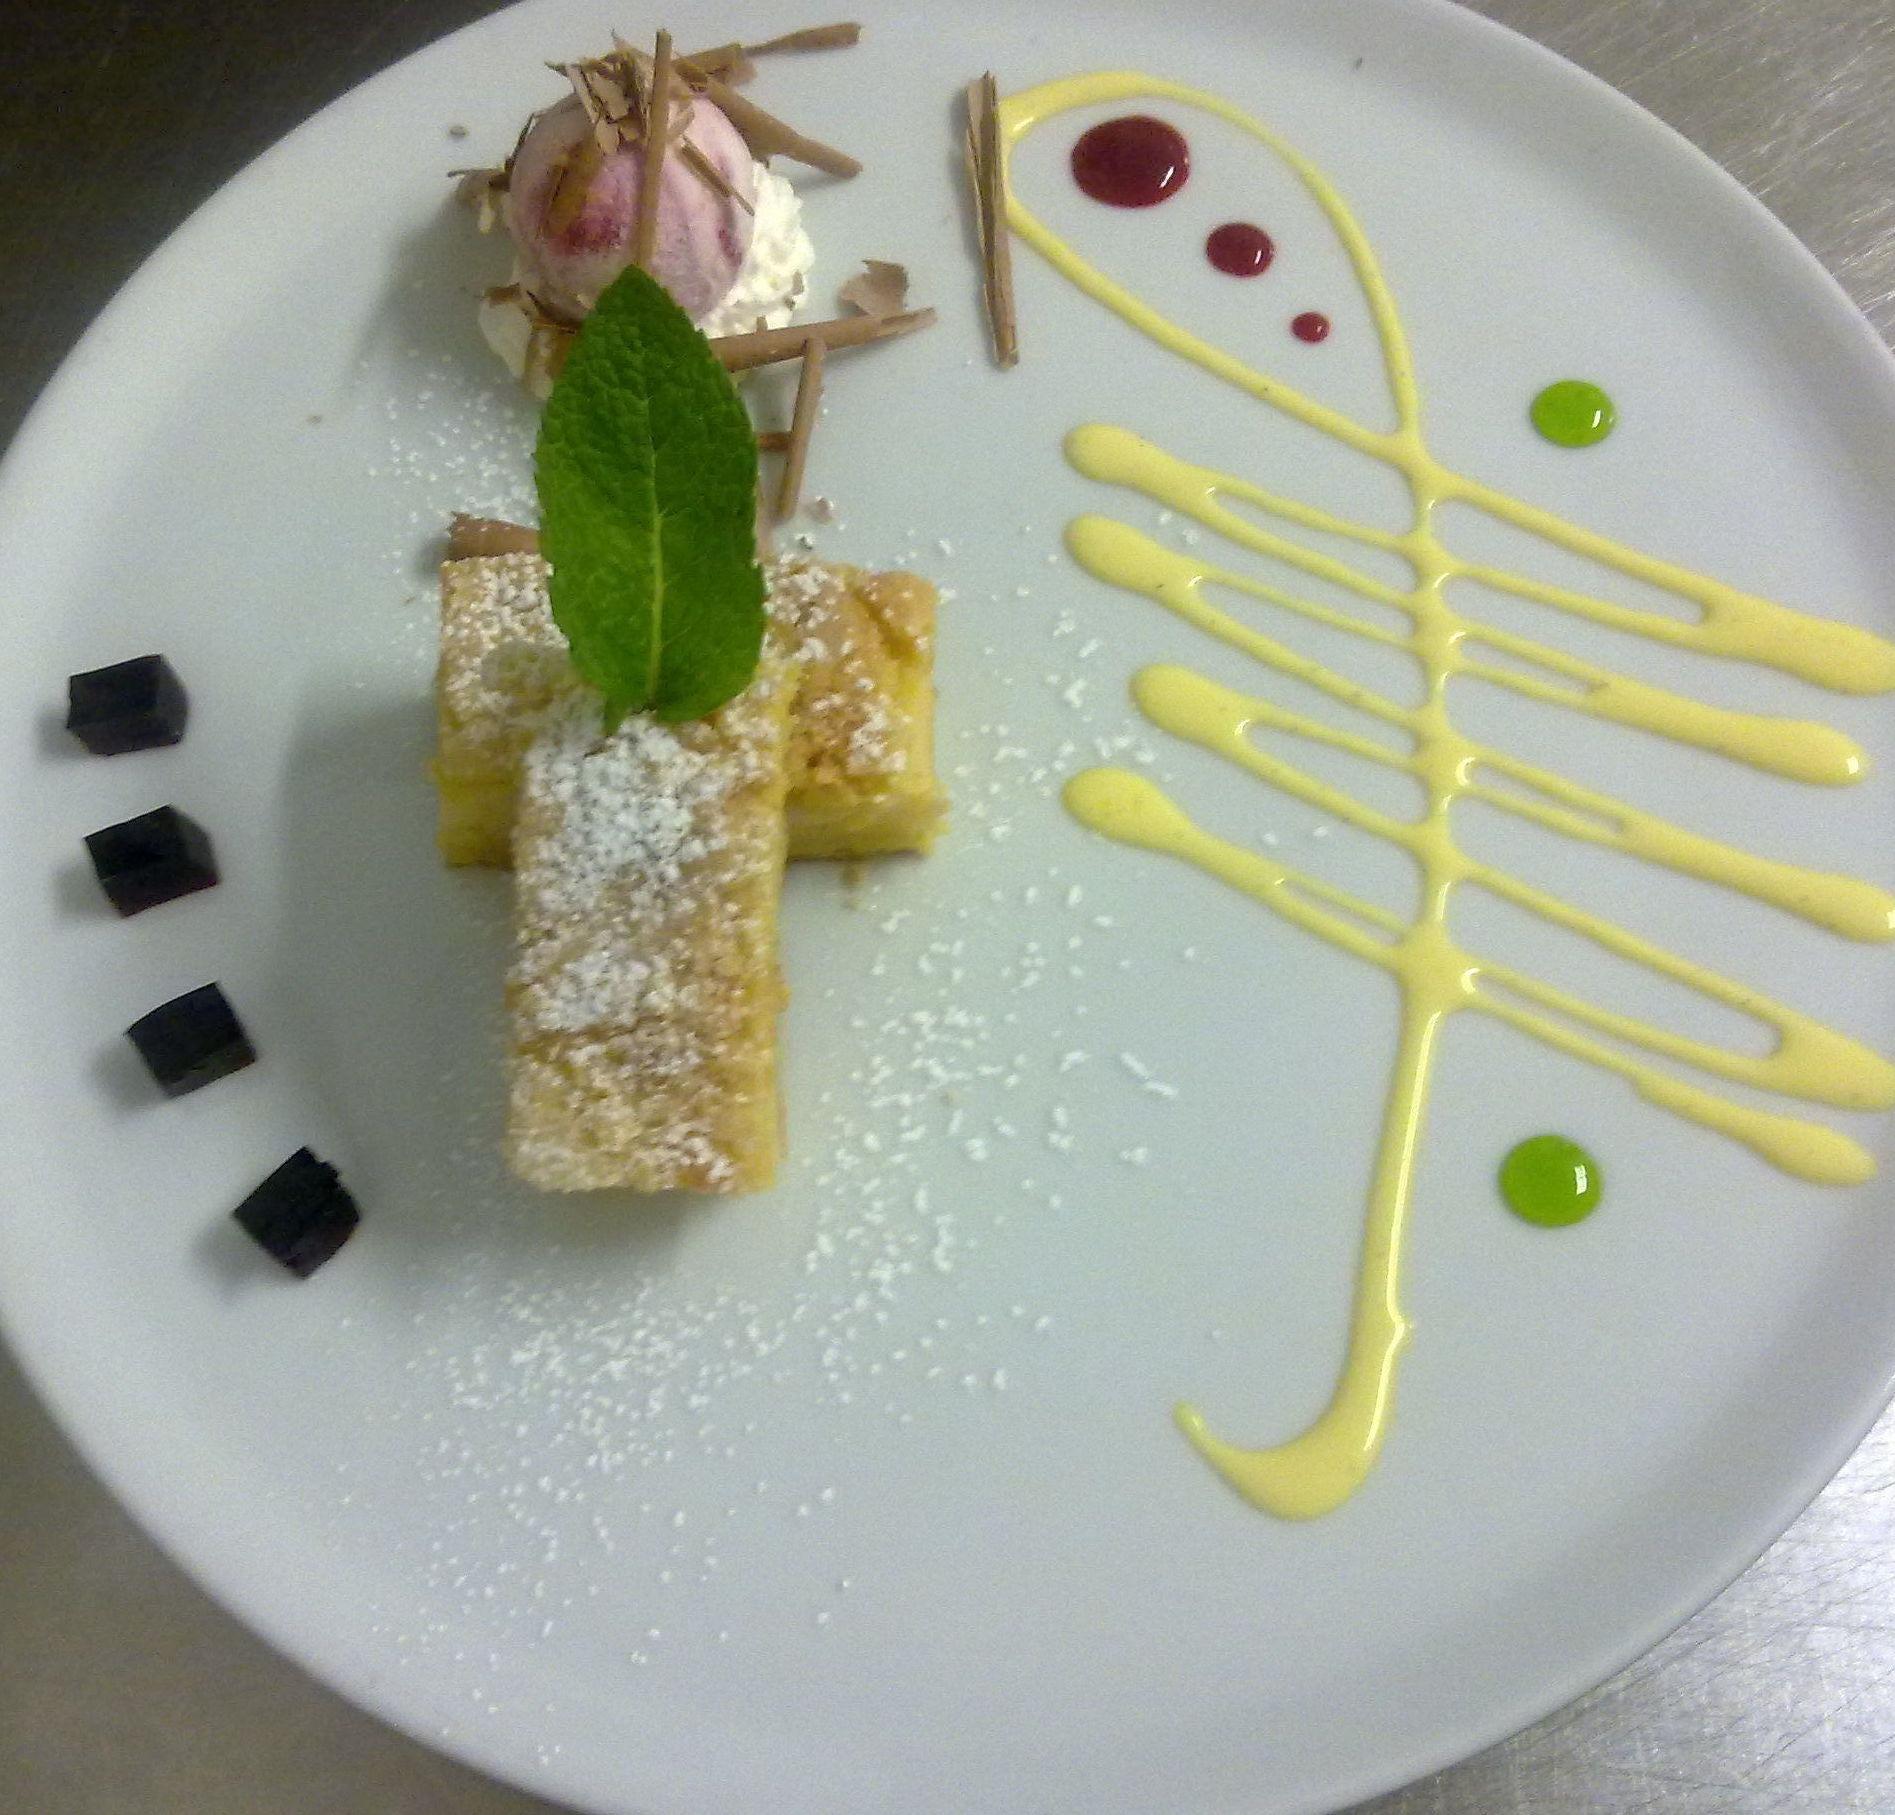 Foto 20 de Cocina navarra en Pamplona | Bar Restaurante Aralar